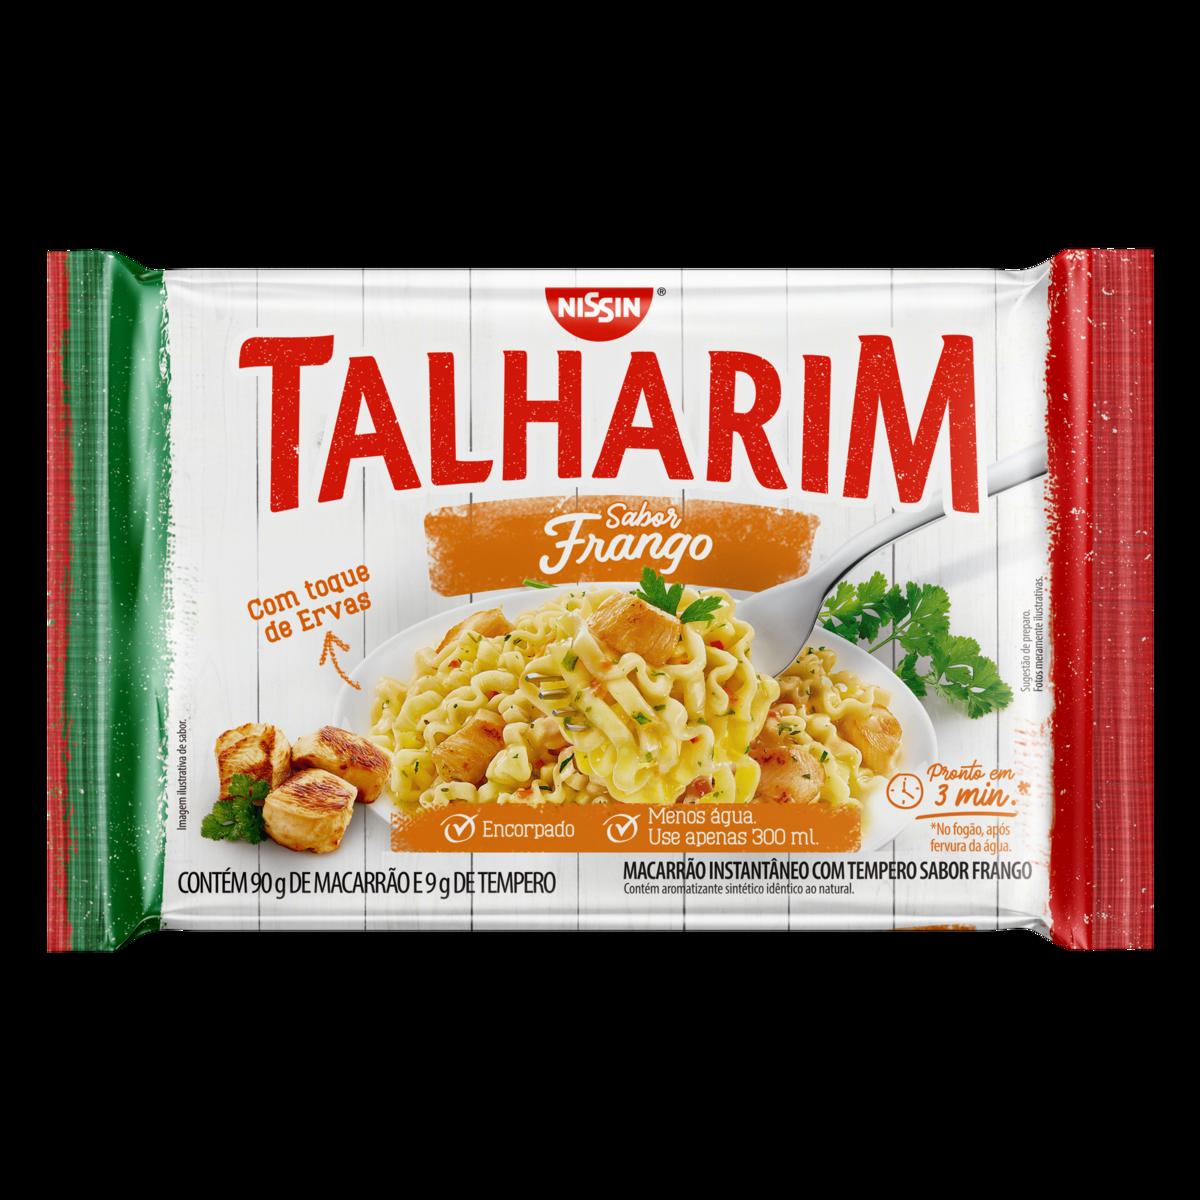 Macarrão Instantâneo sabor Frango 99g Nissin Talharim pacote UN